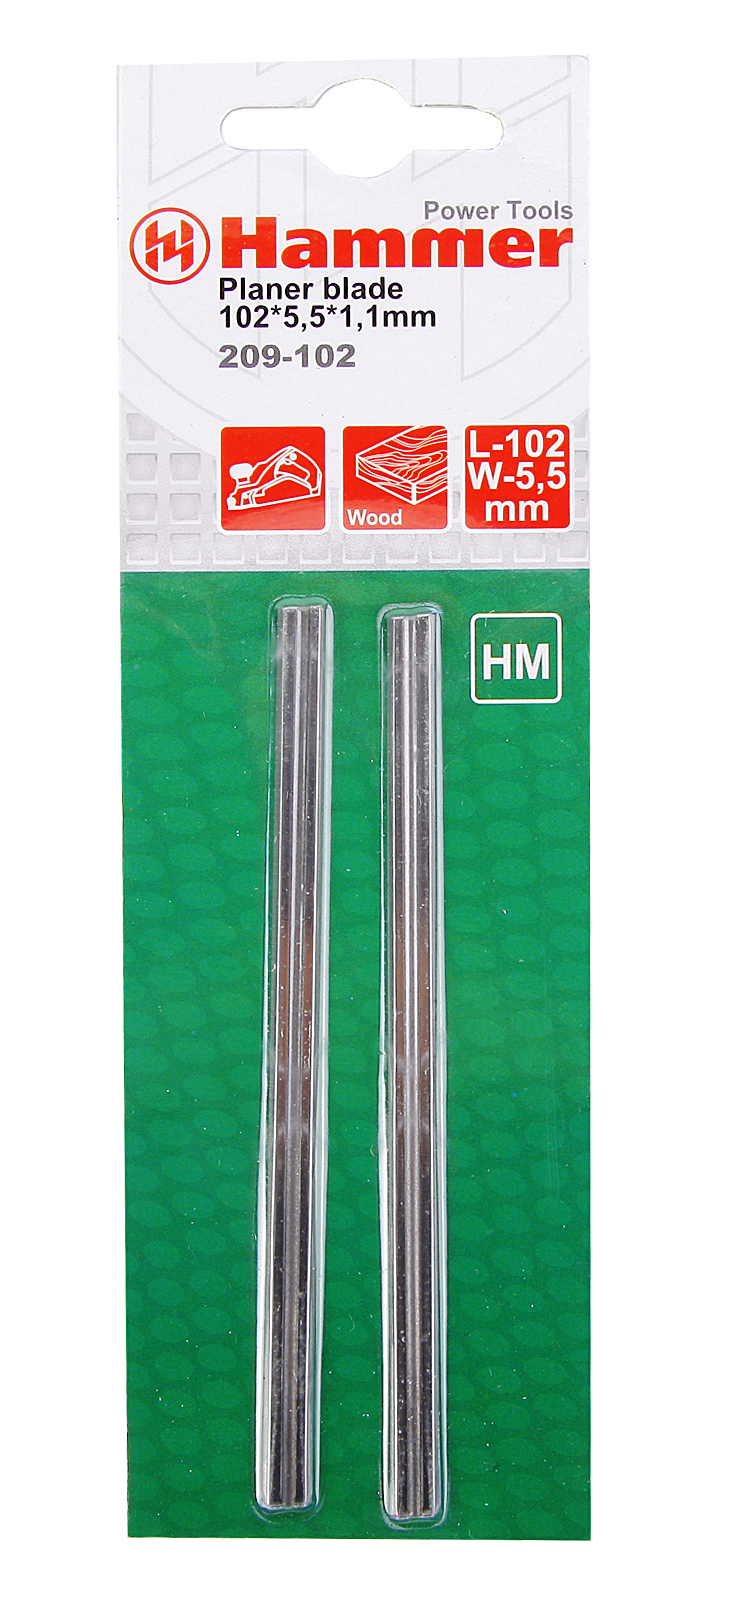 Ножи для рубанка Hammer 102мм (flex 209-102)